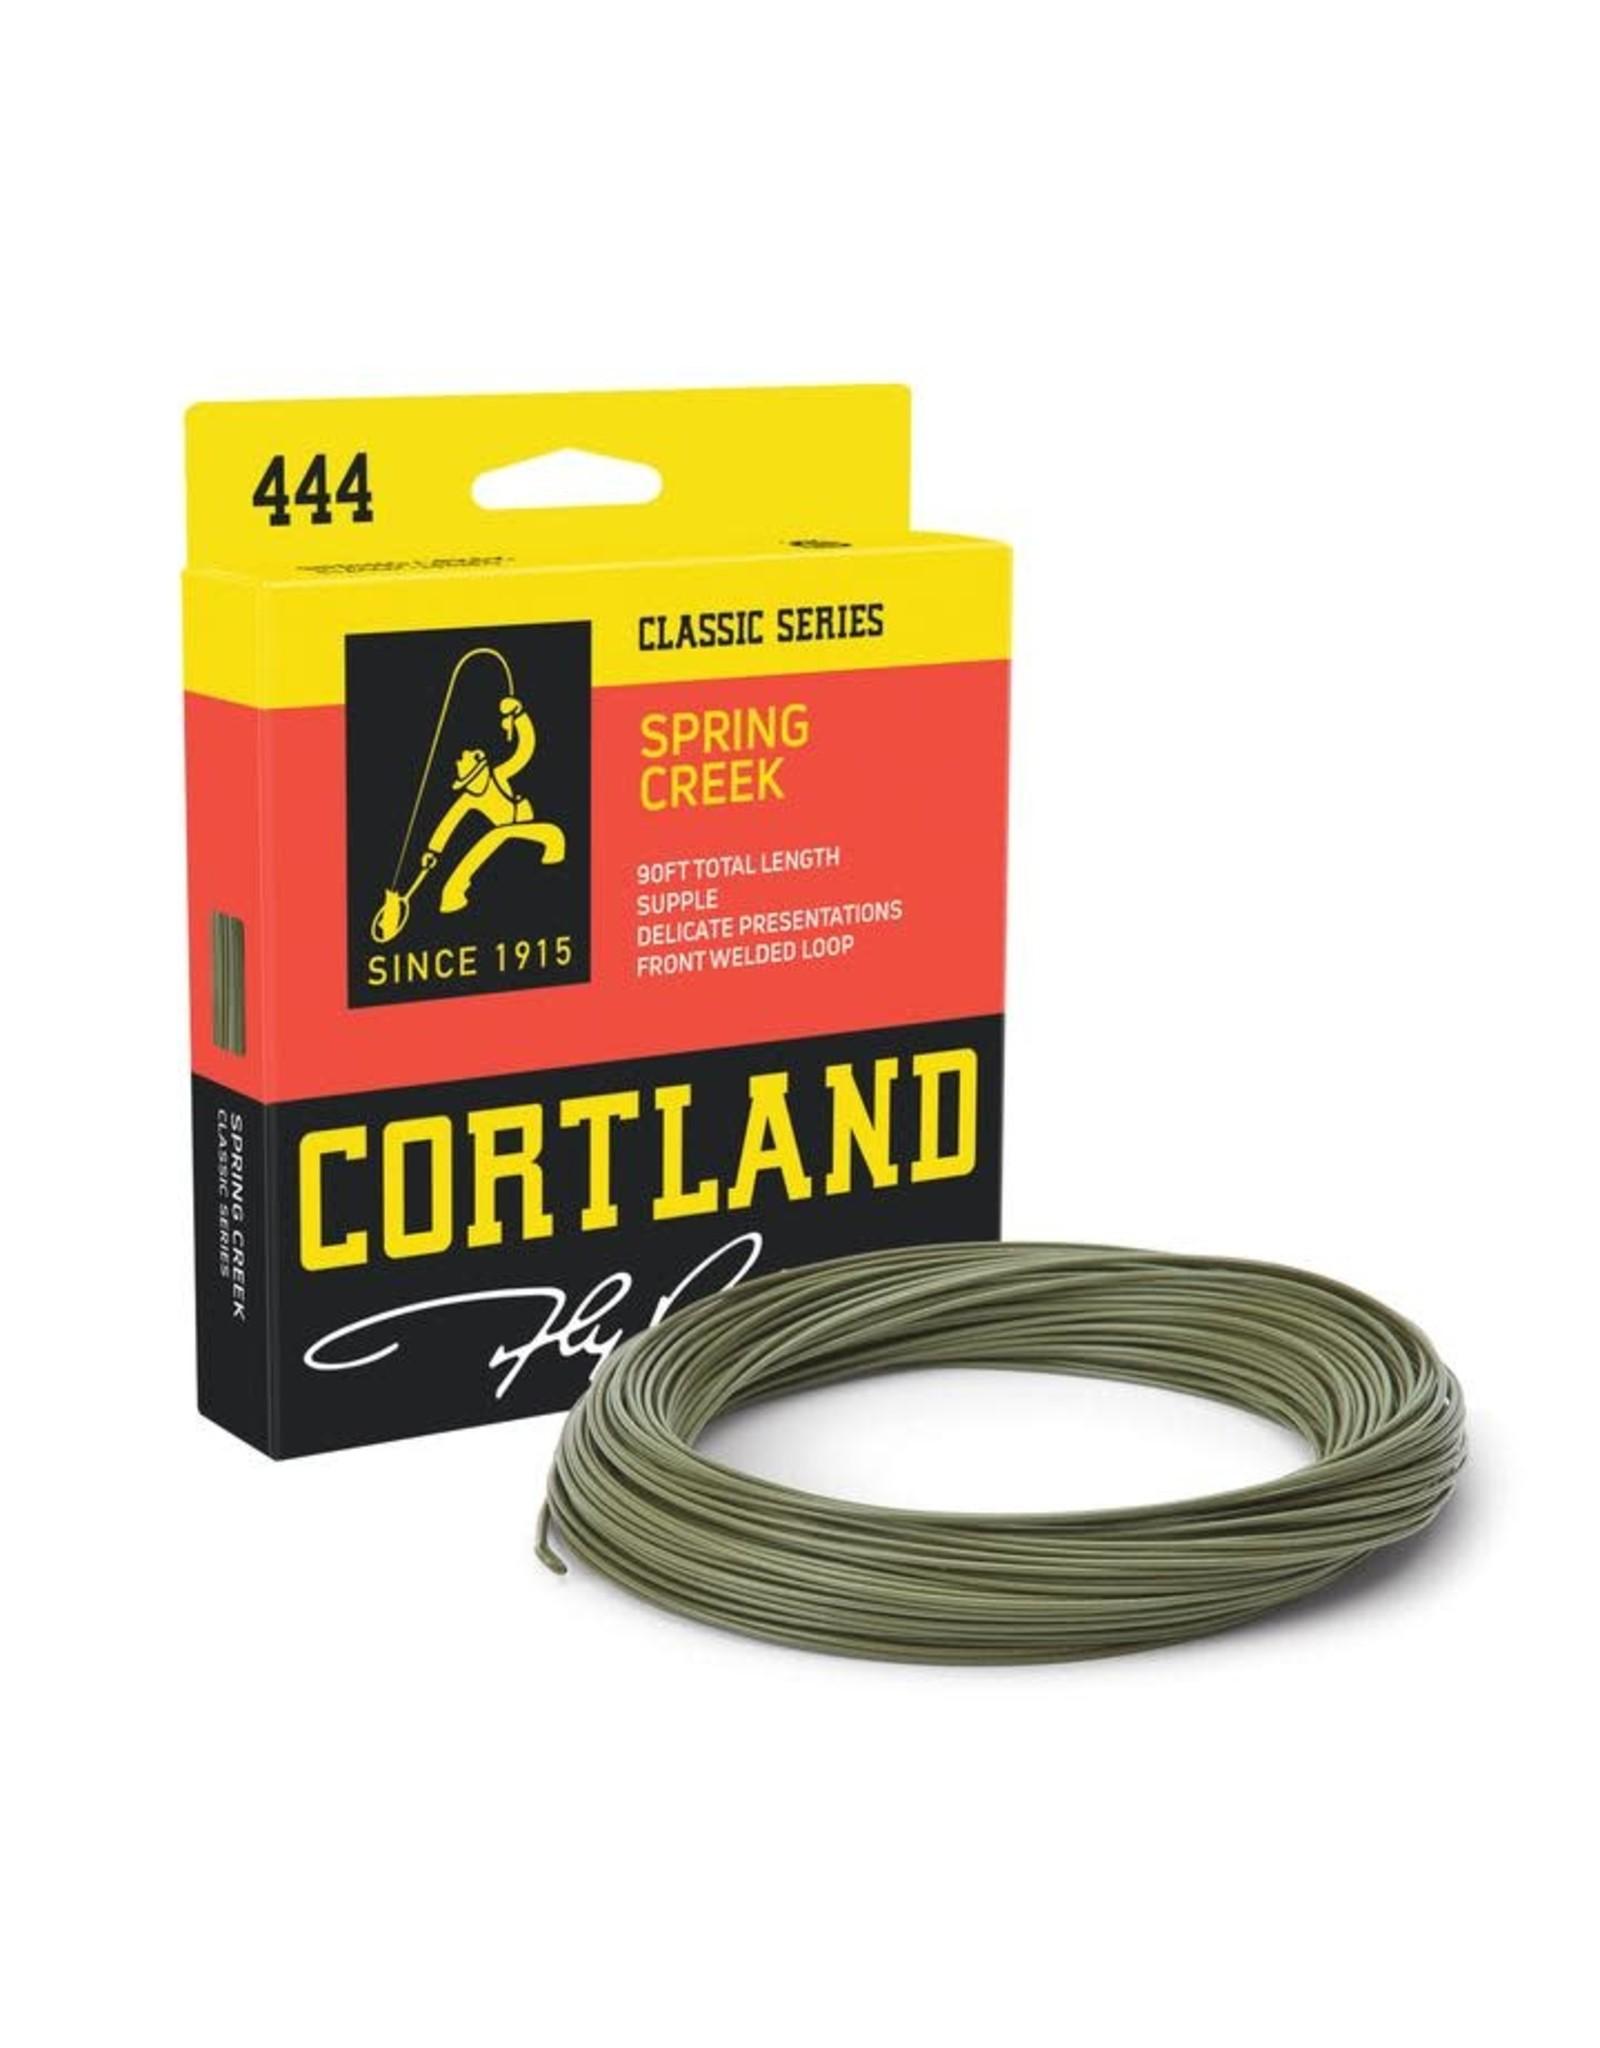 Cortland Line Cortland Line 444 Classic Series Spring Creek Fly Line